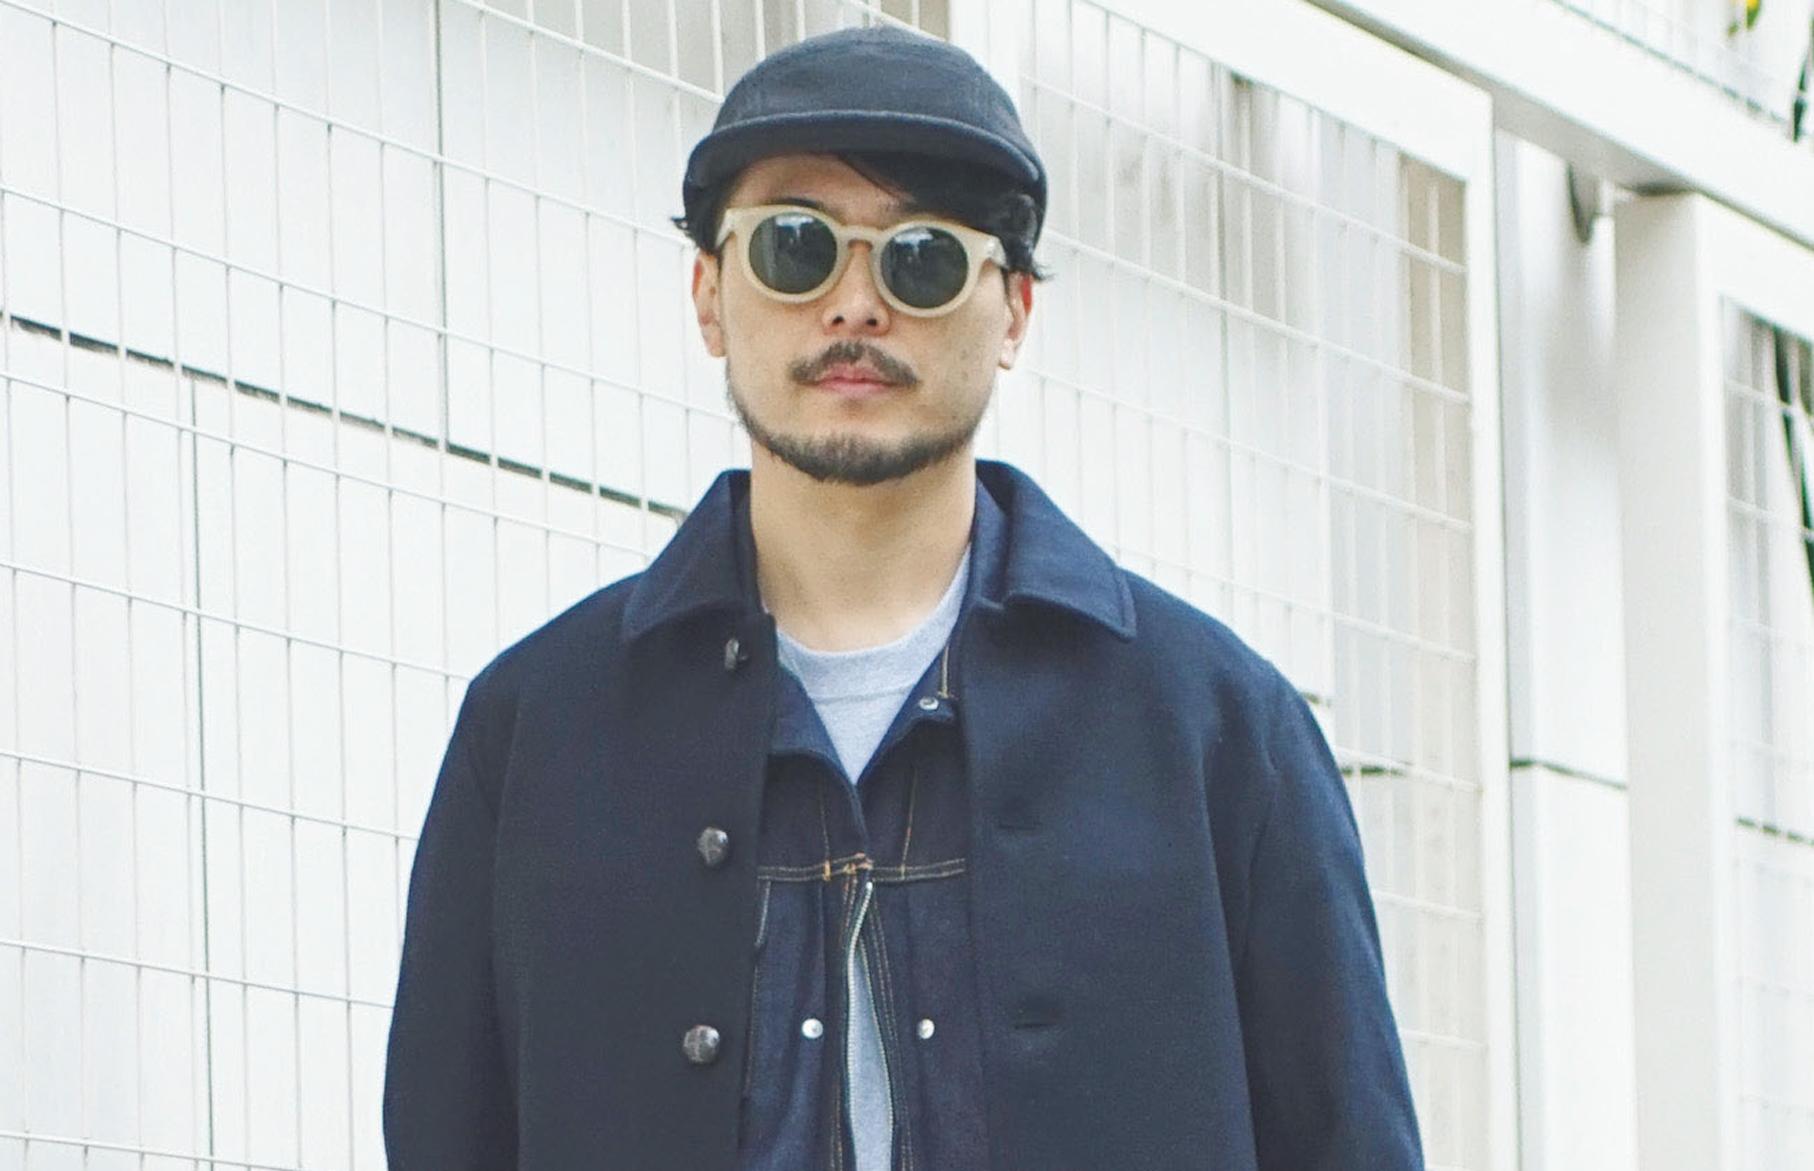 aae0deec5af2 ユニクロ、GU、無印良品etc. 真似したい!バリュー服の大人使い ~無印良品編~ – Men'sJOKER PREMIUM | メンズファッション雑誌